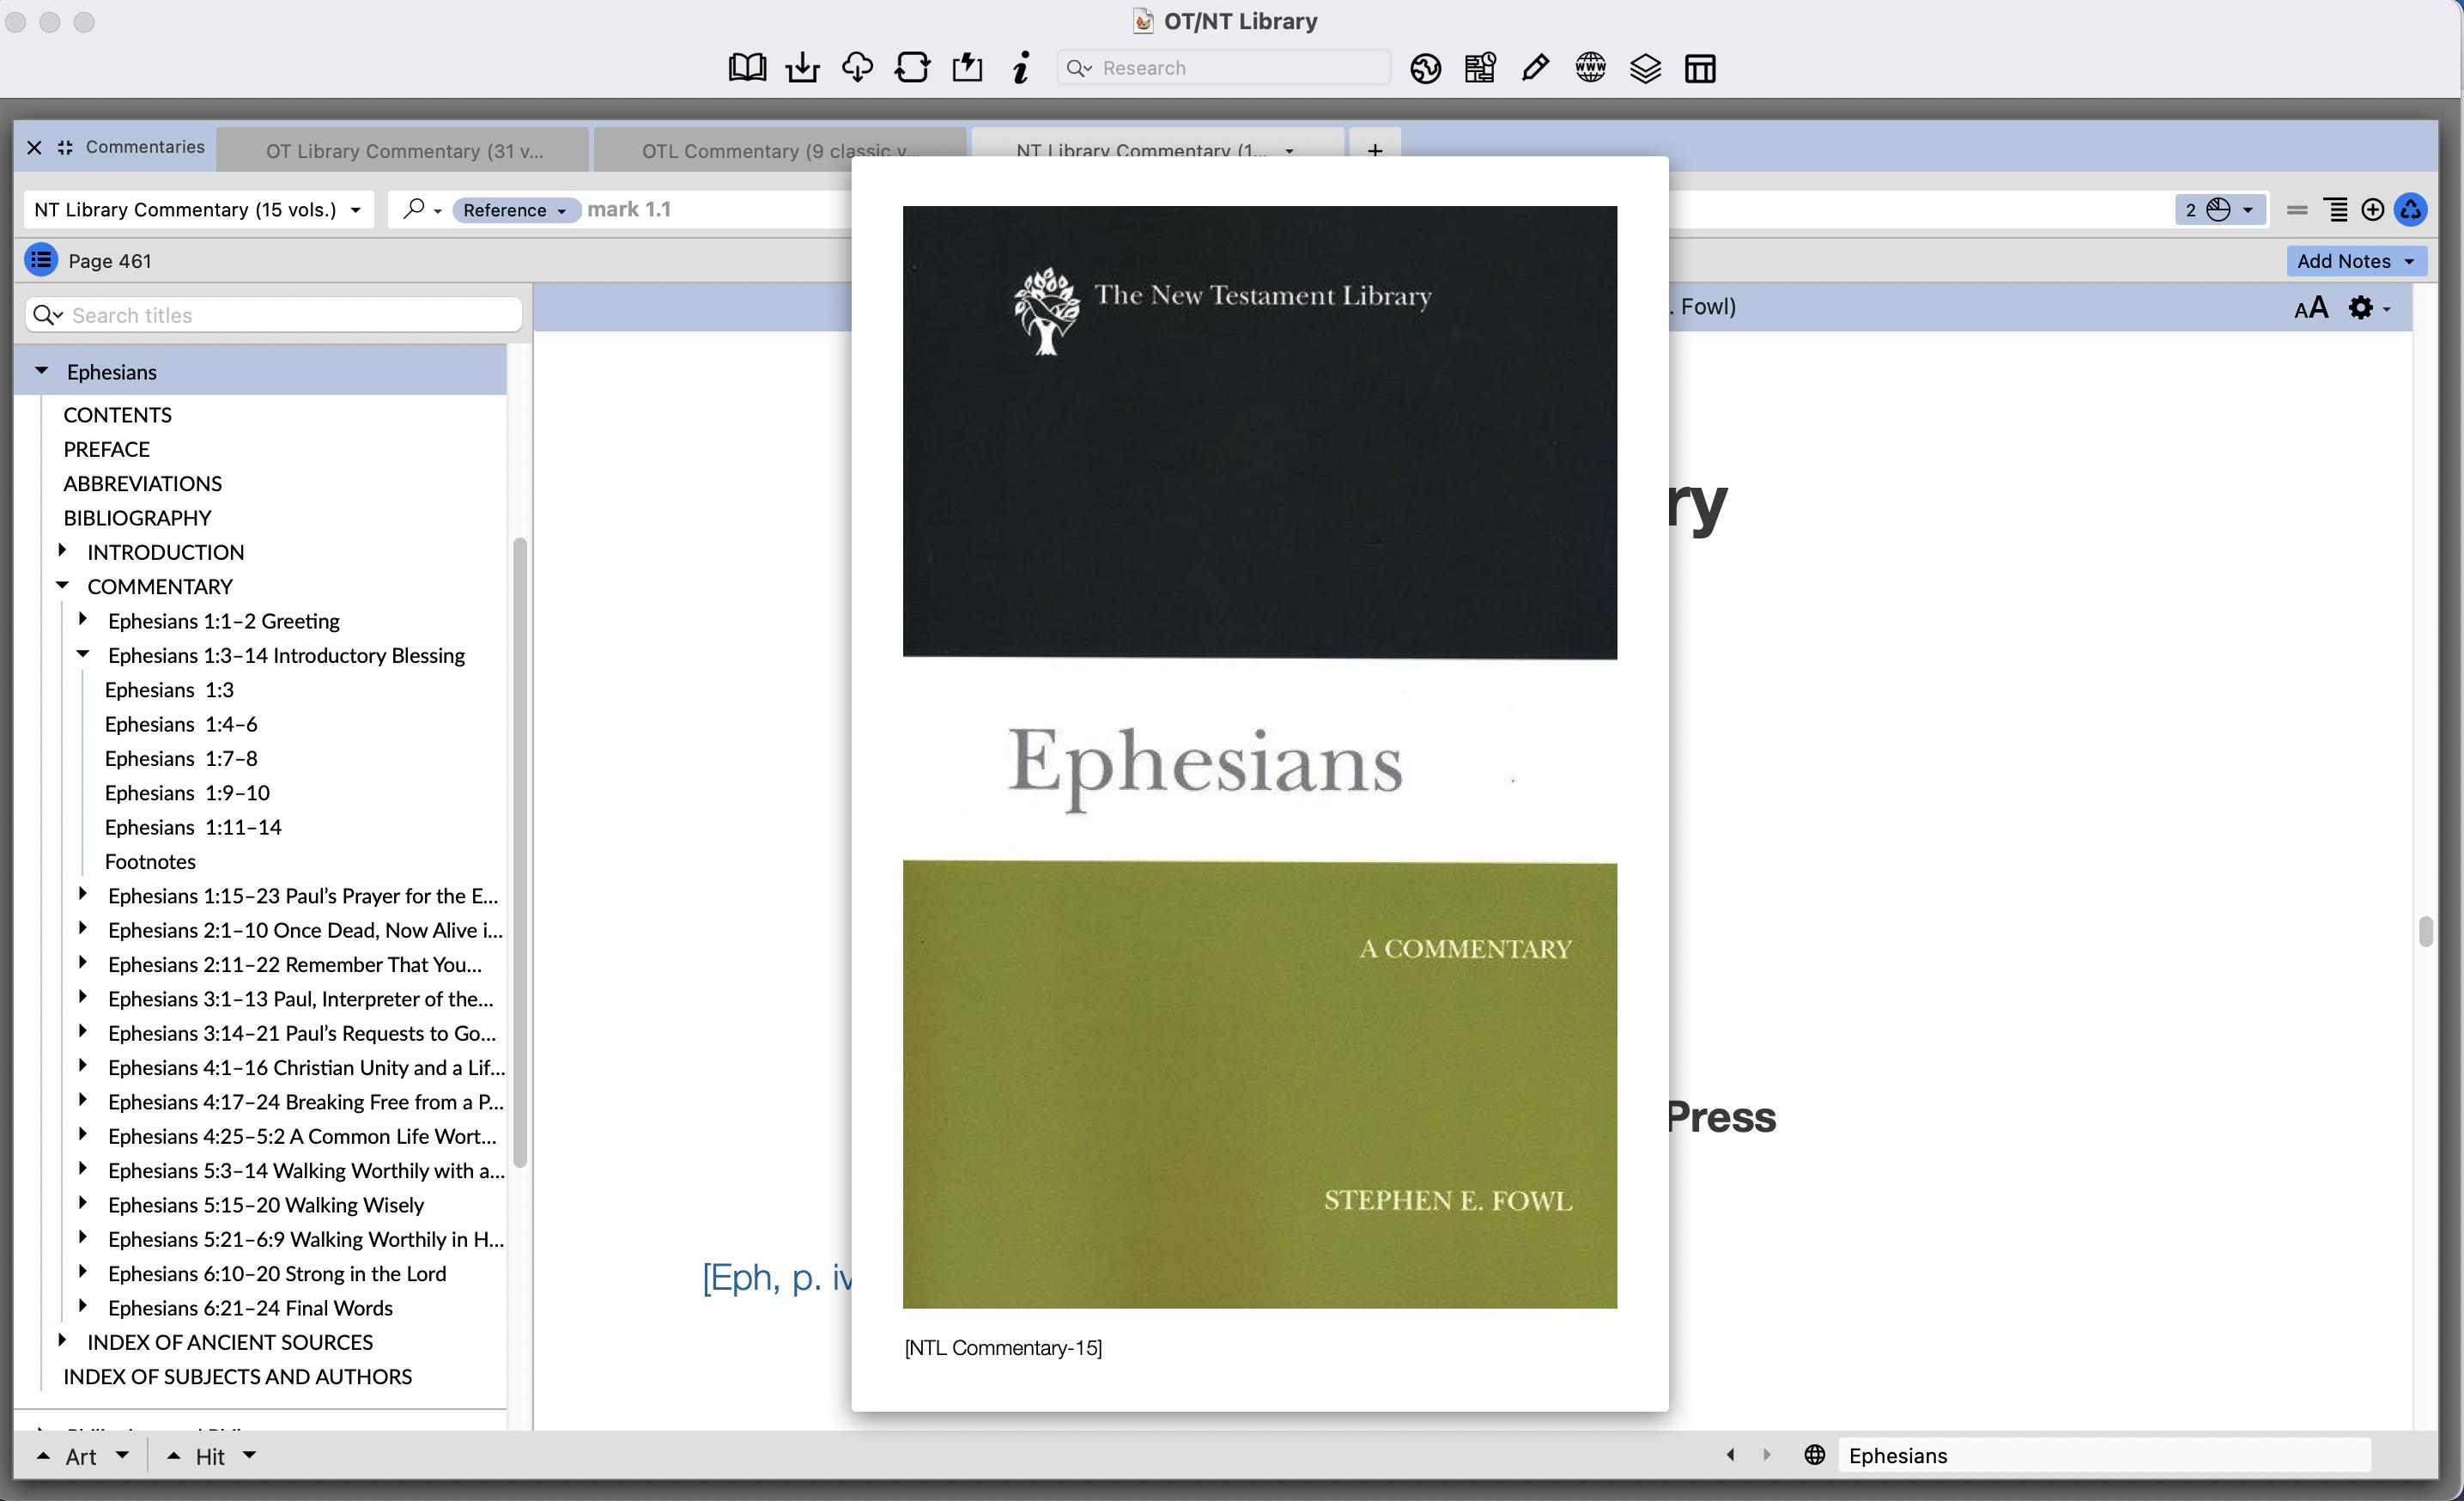 Stephen Fowl on Ephesians